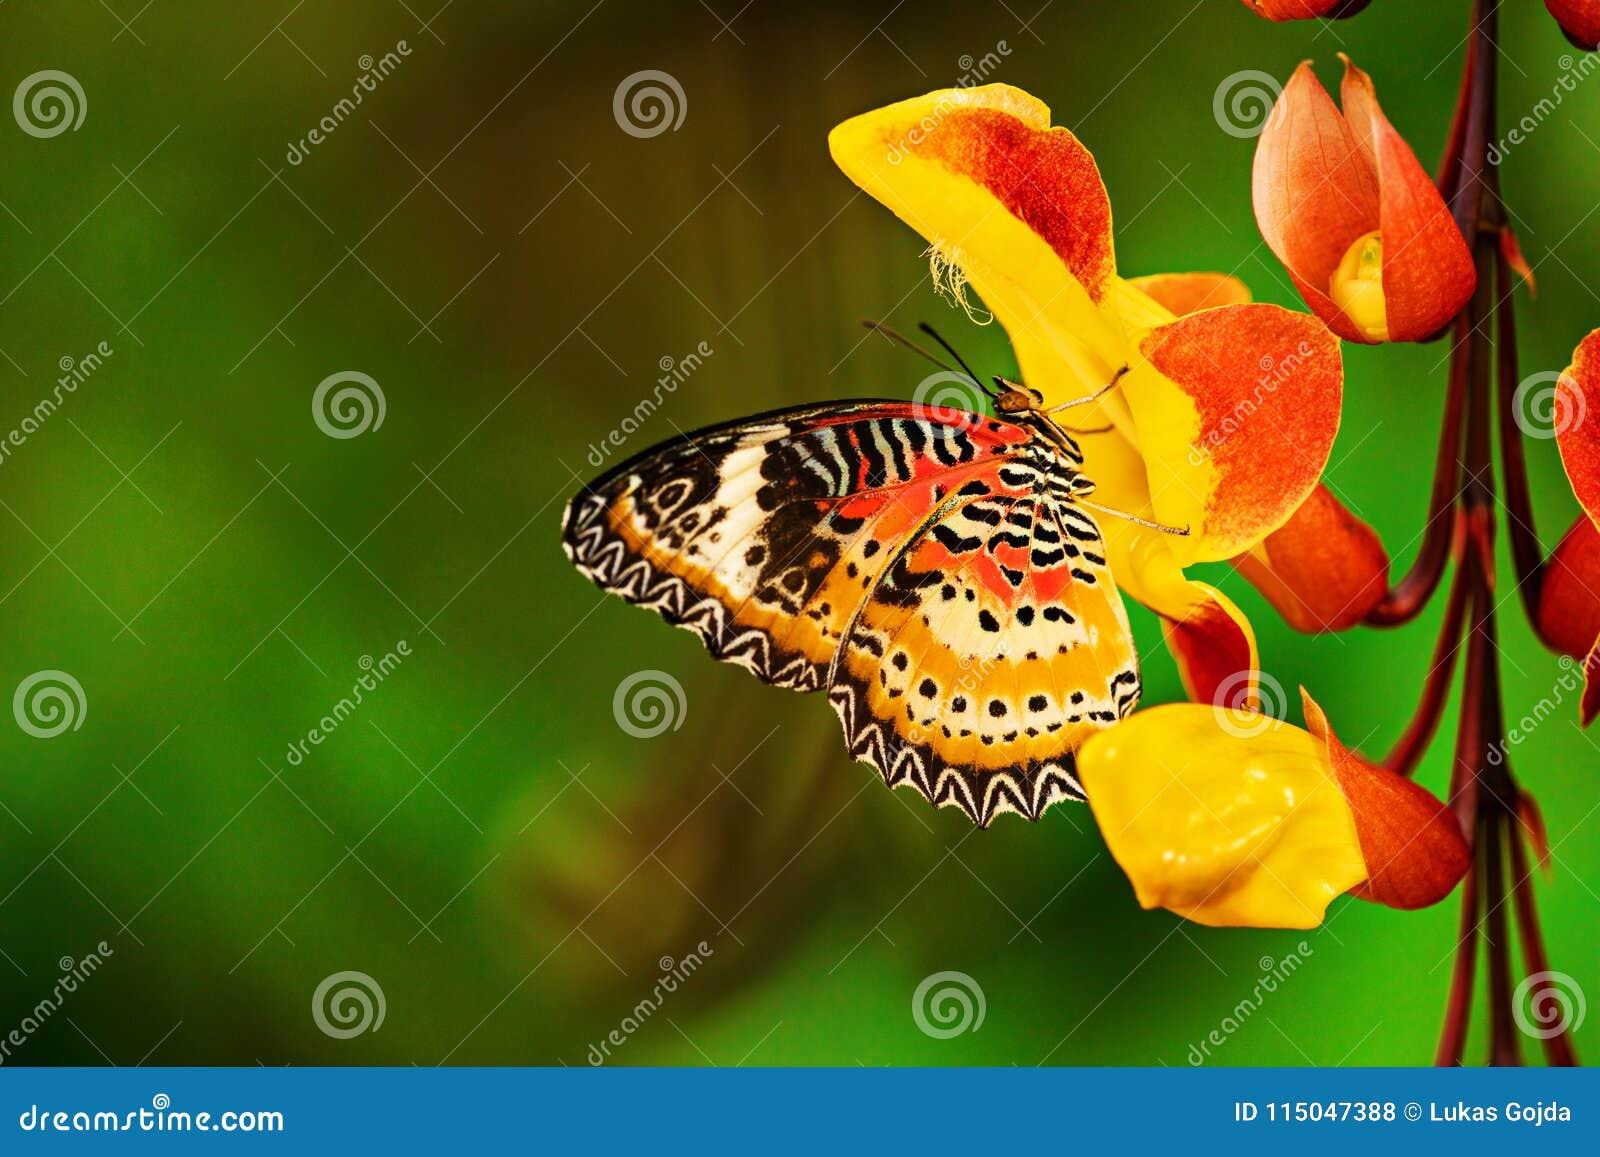 Monarch butterfly Danaus plexippus on thunbergia mysorensis.